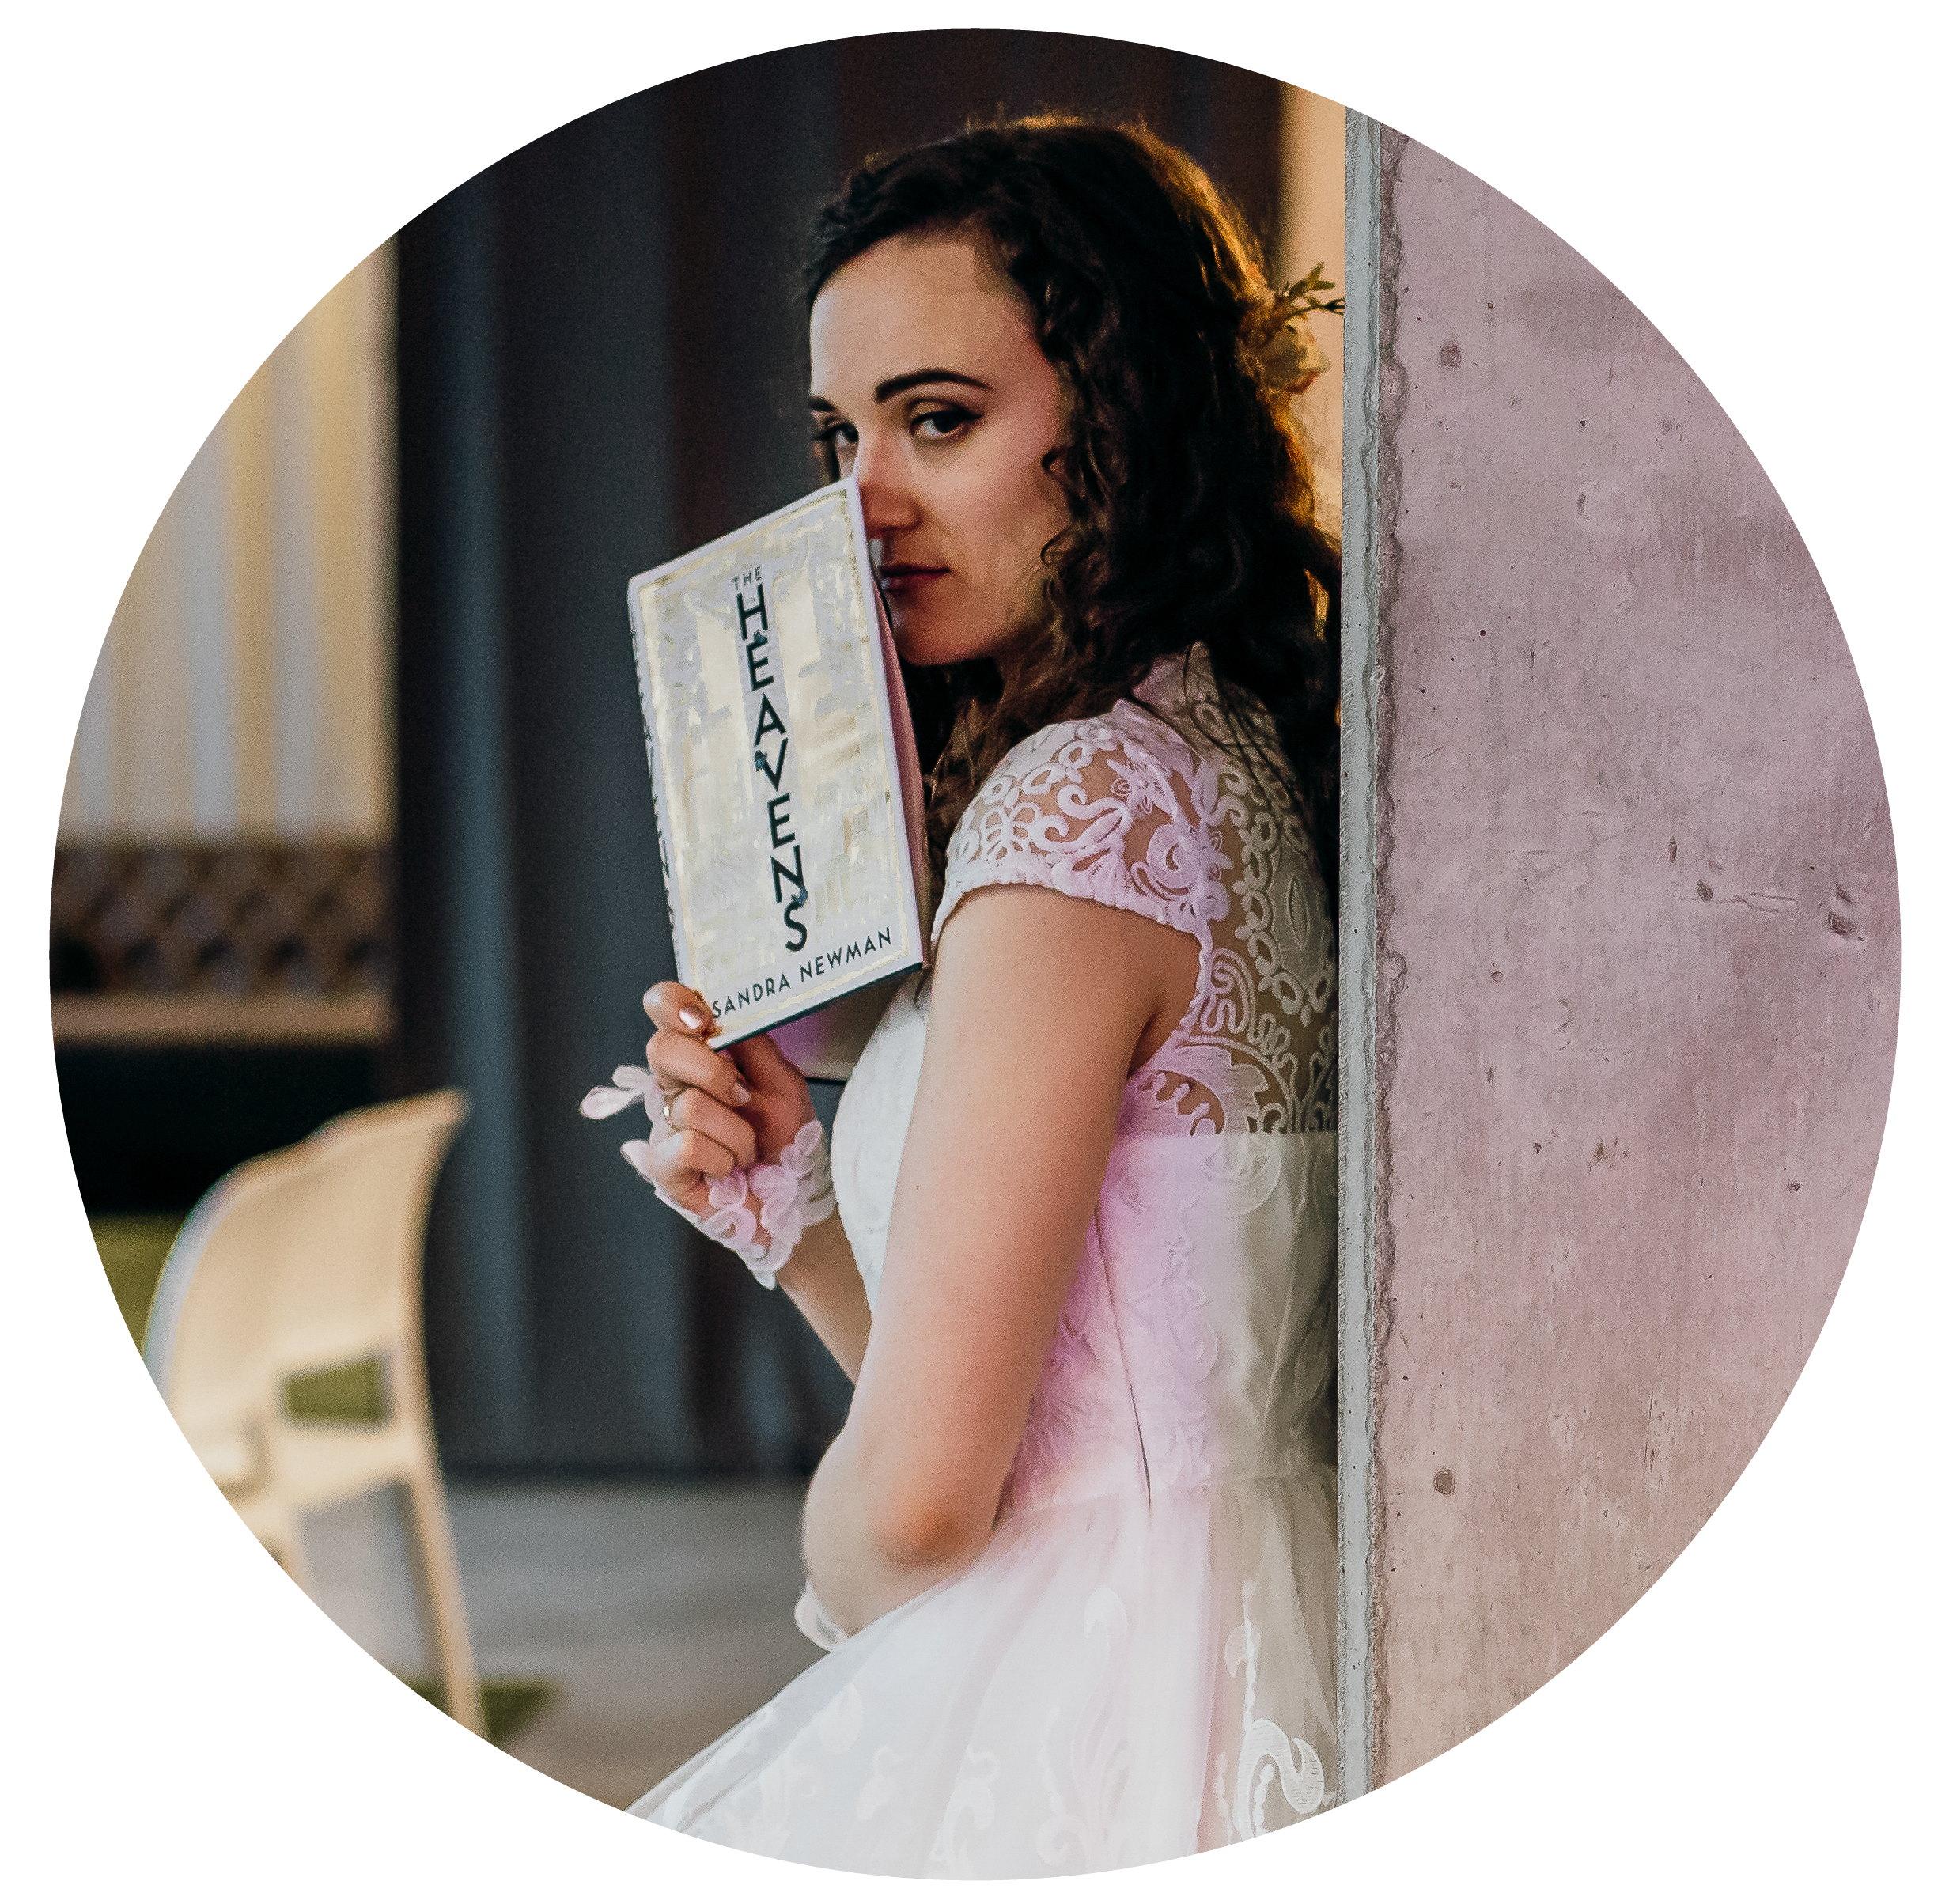 Evelina AvalinahsBooks